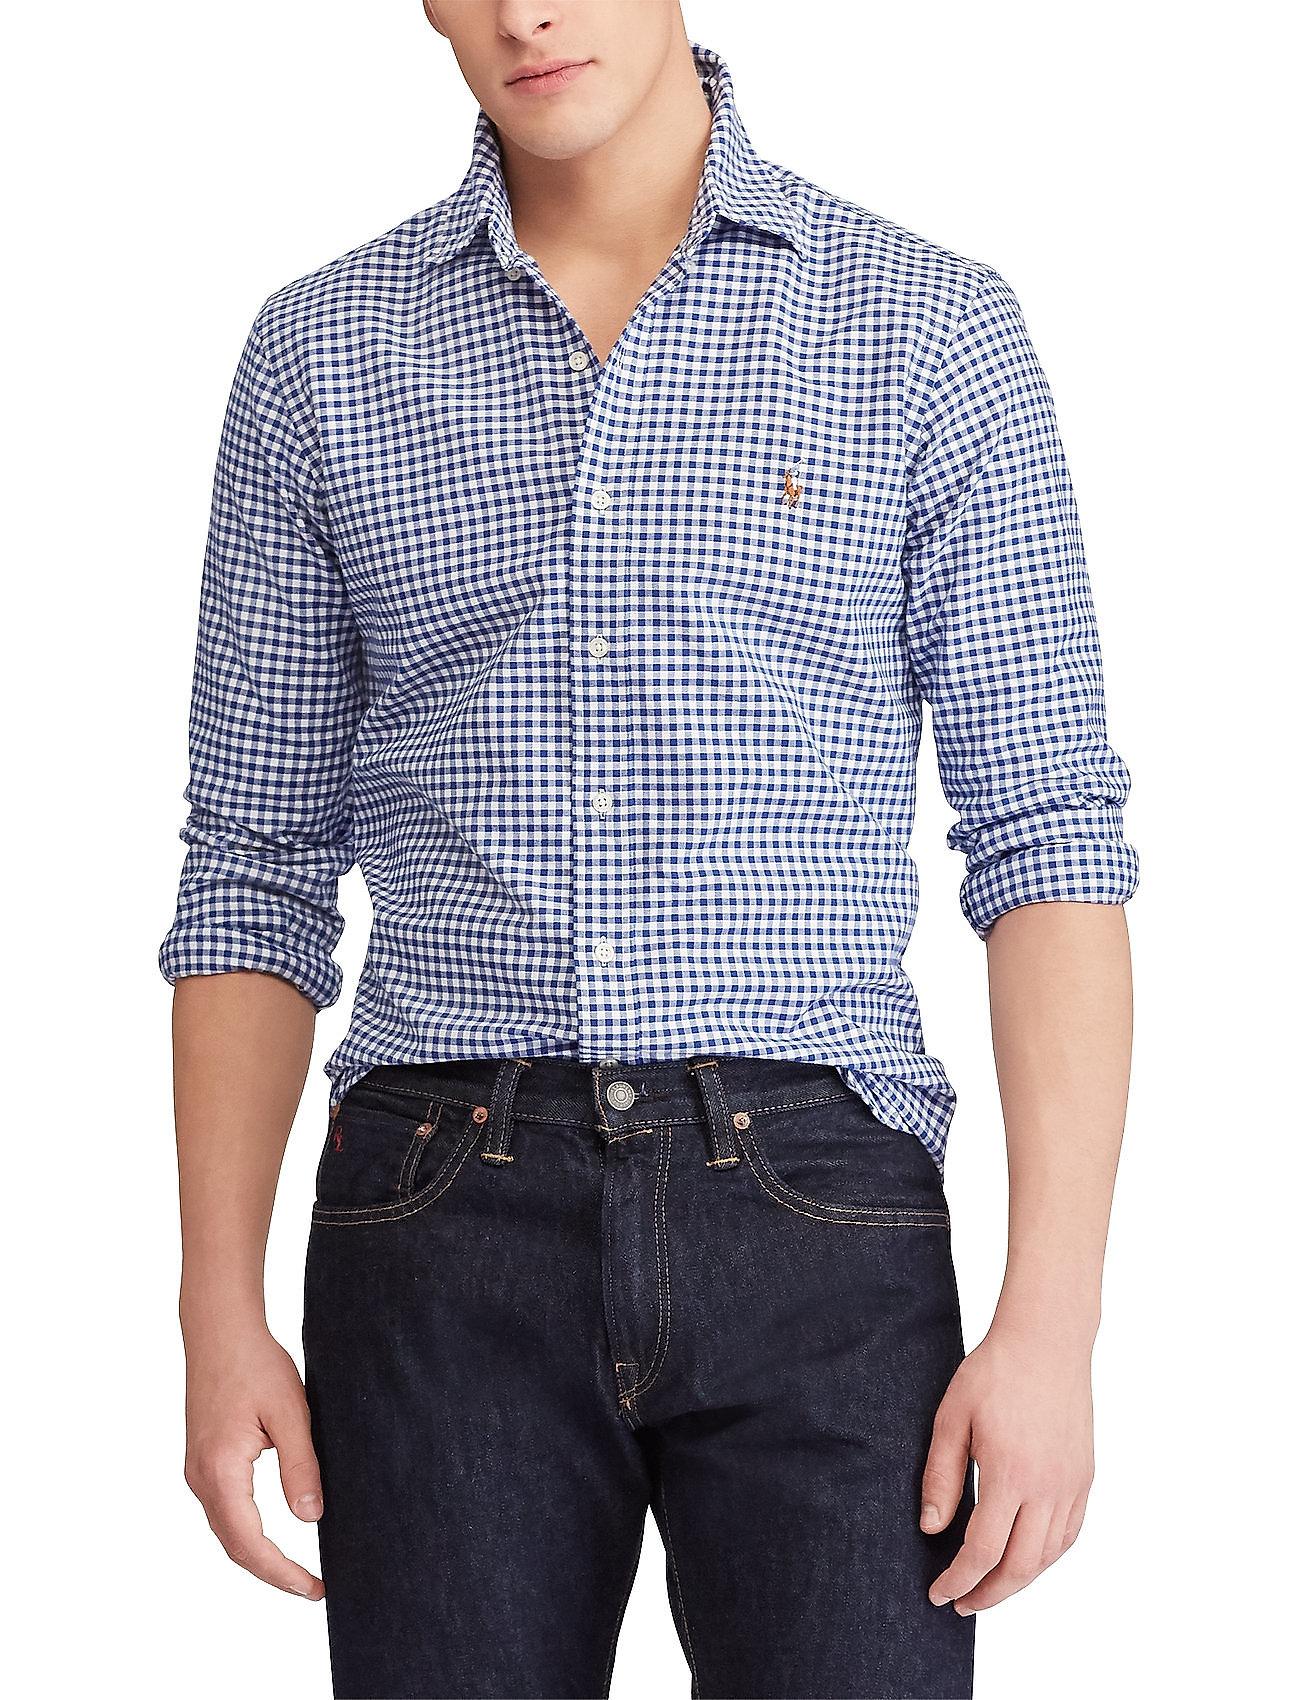 Polo Ralph Lauren - Slim Fit Oxford Sport Shirt - rūtaini krekli - blue/white ging - 0